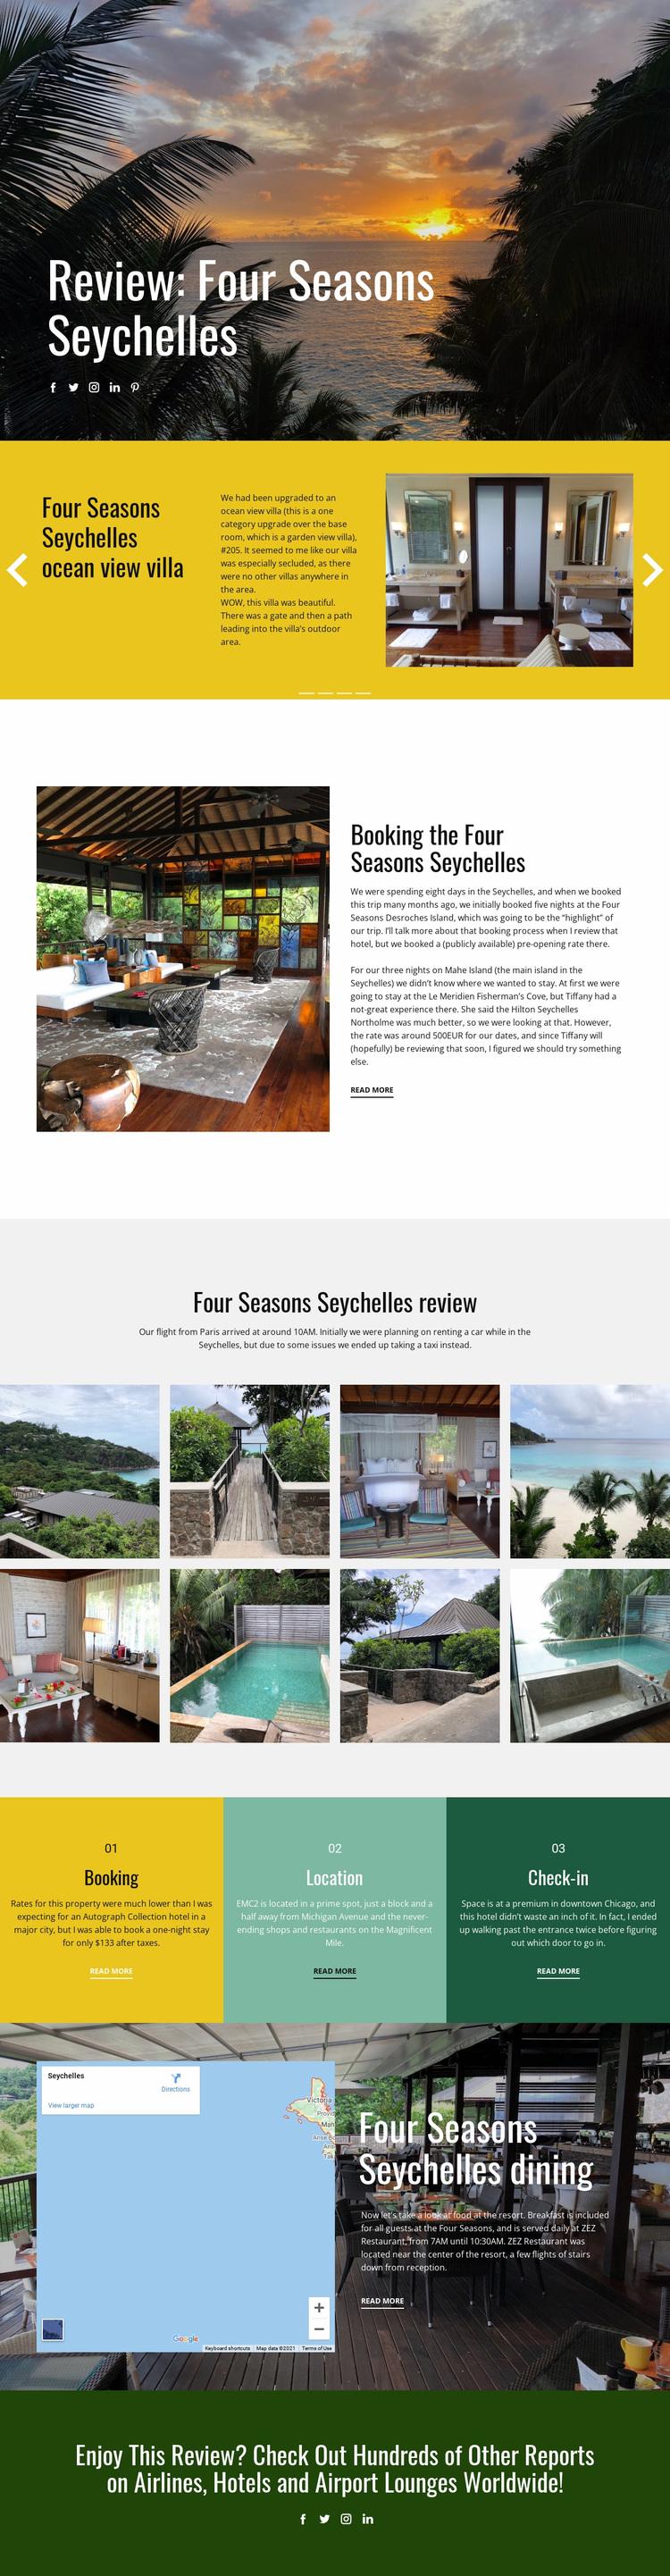 Four Seasons Website Design